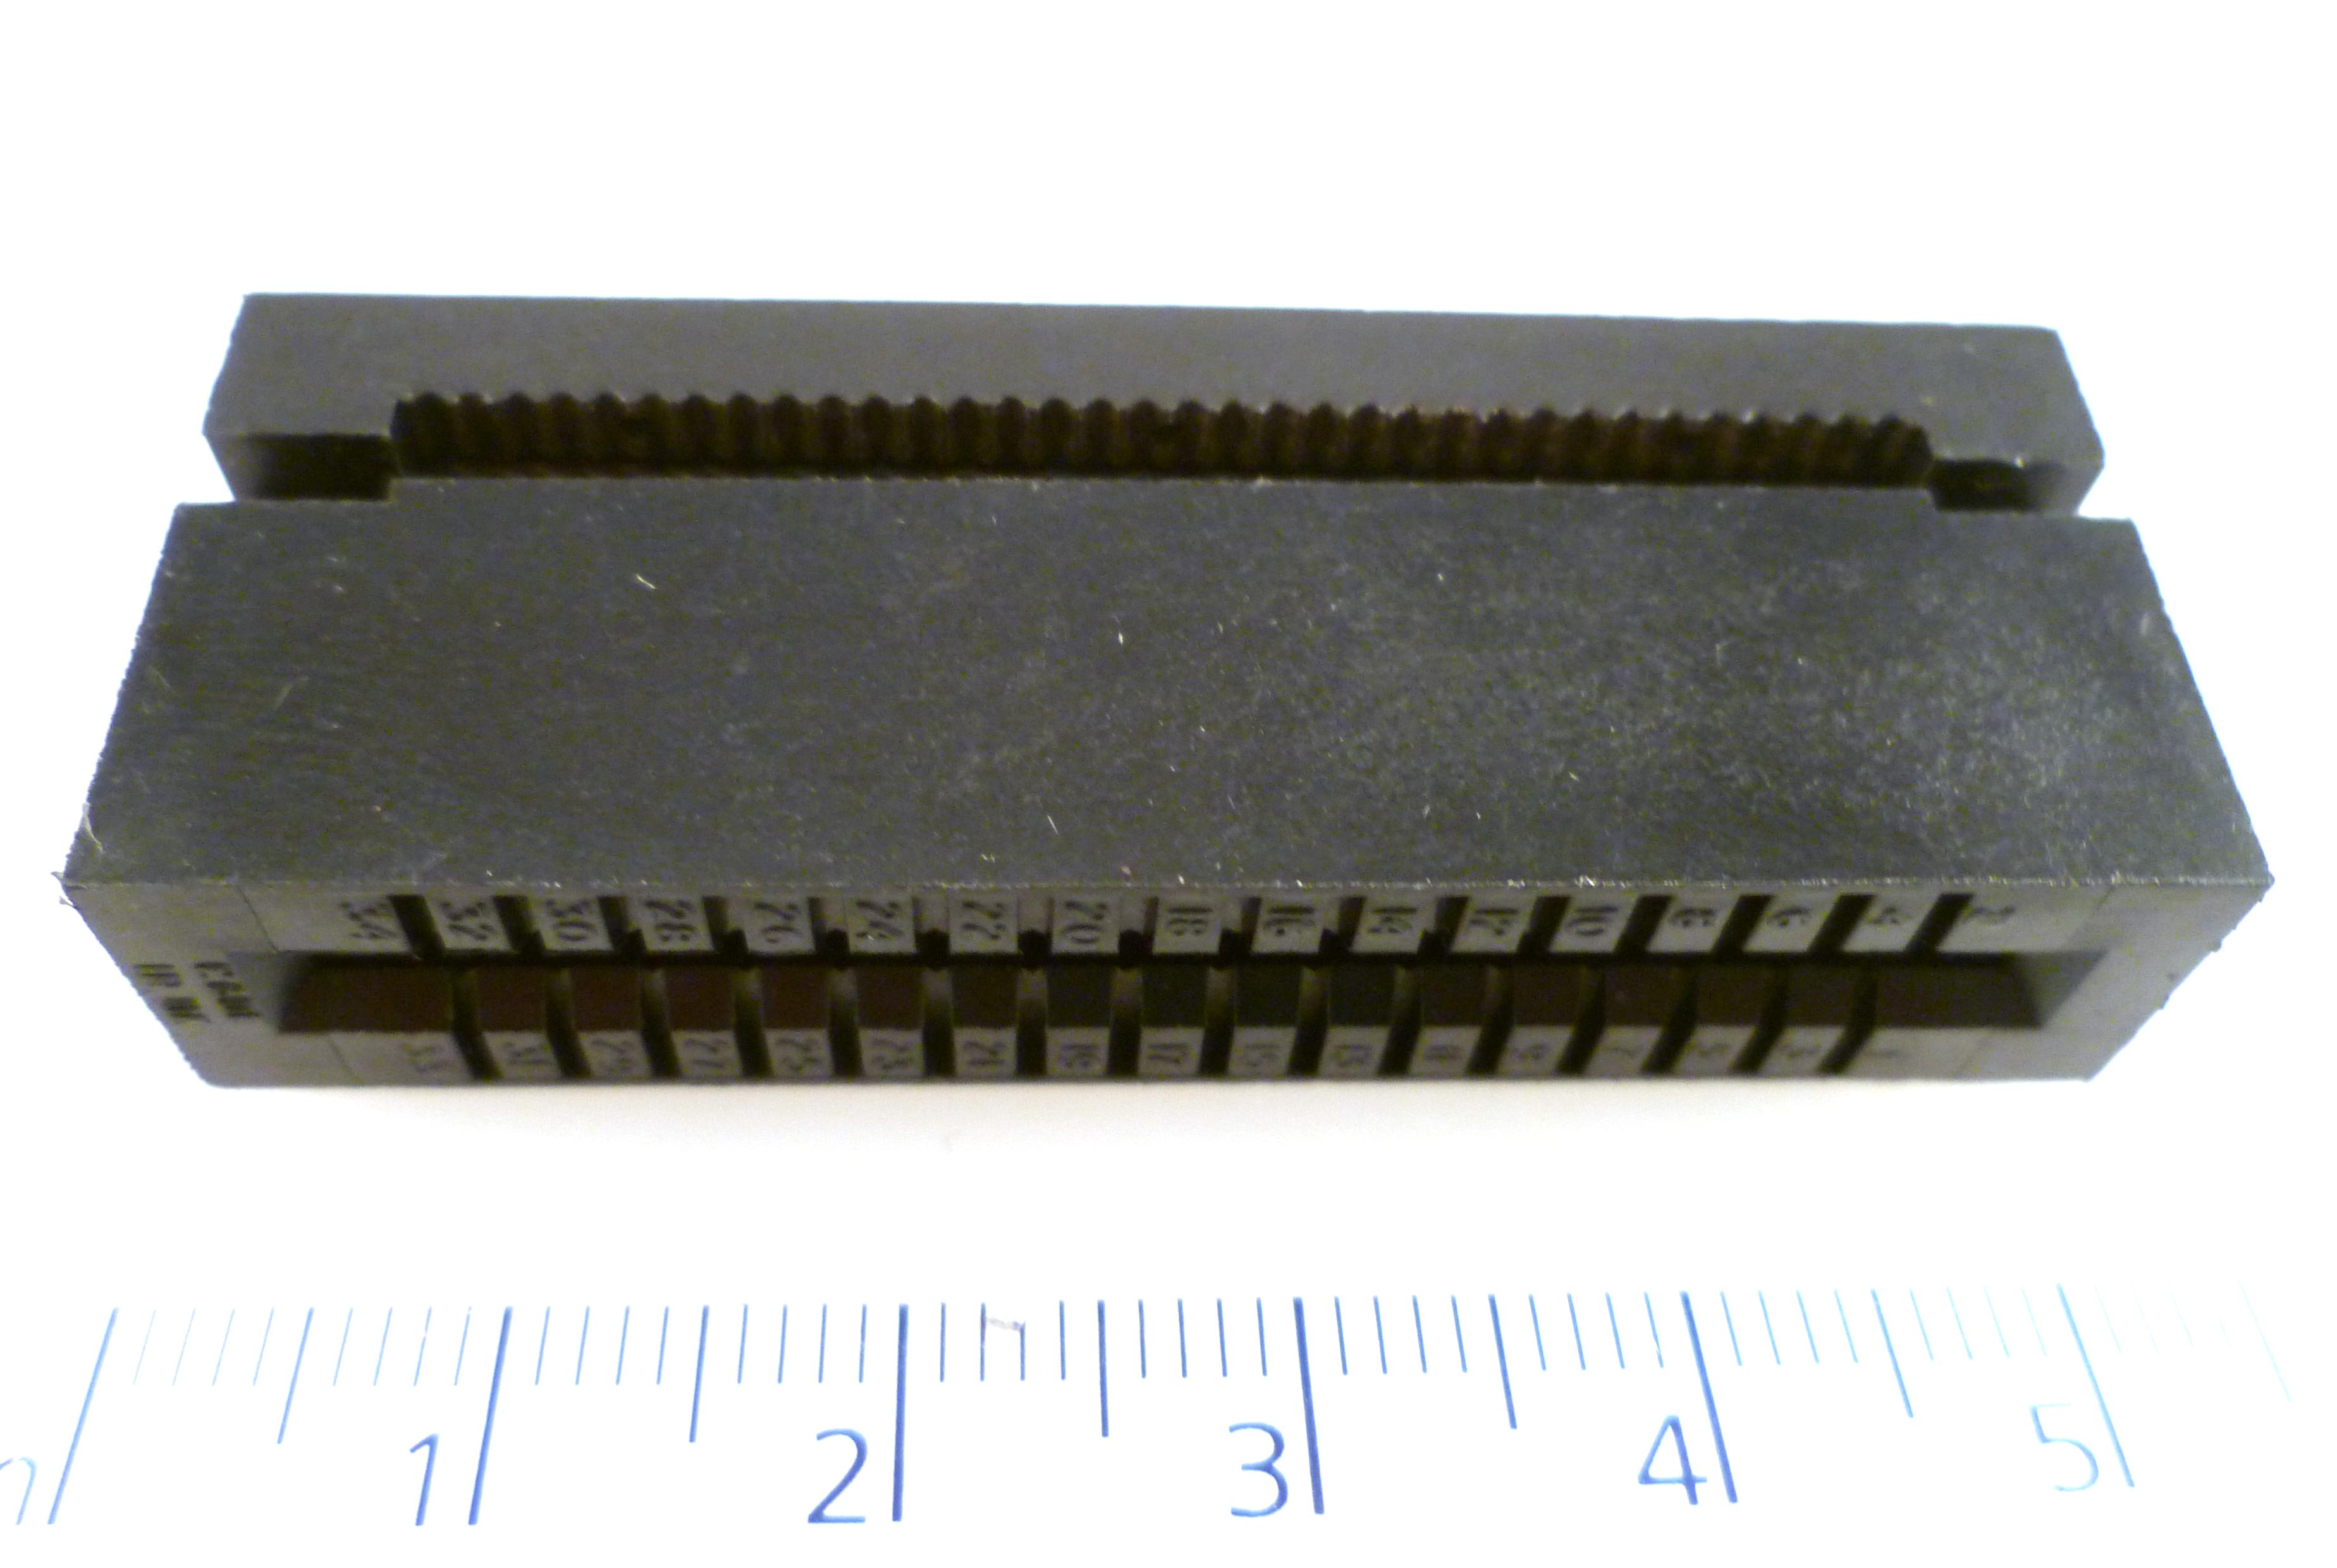 MIDLAND ROSS CD6734 BRN 34 Way IDC Ribbon Cable Card edge connector MBH011i